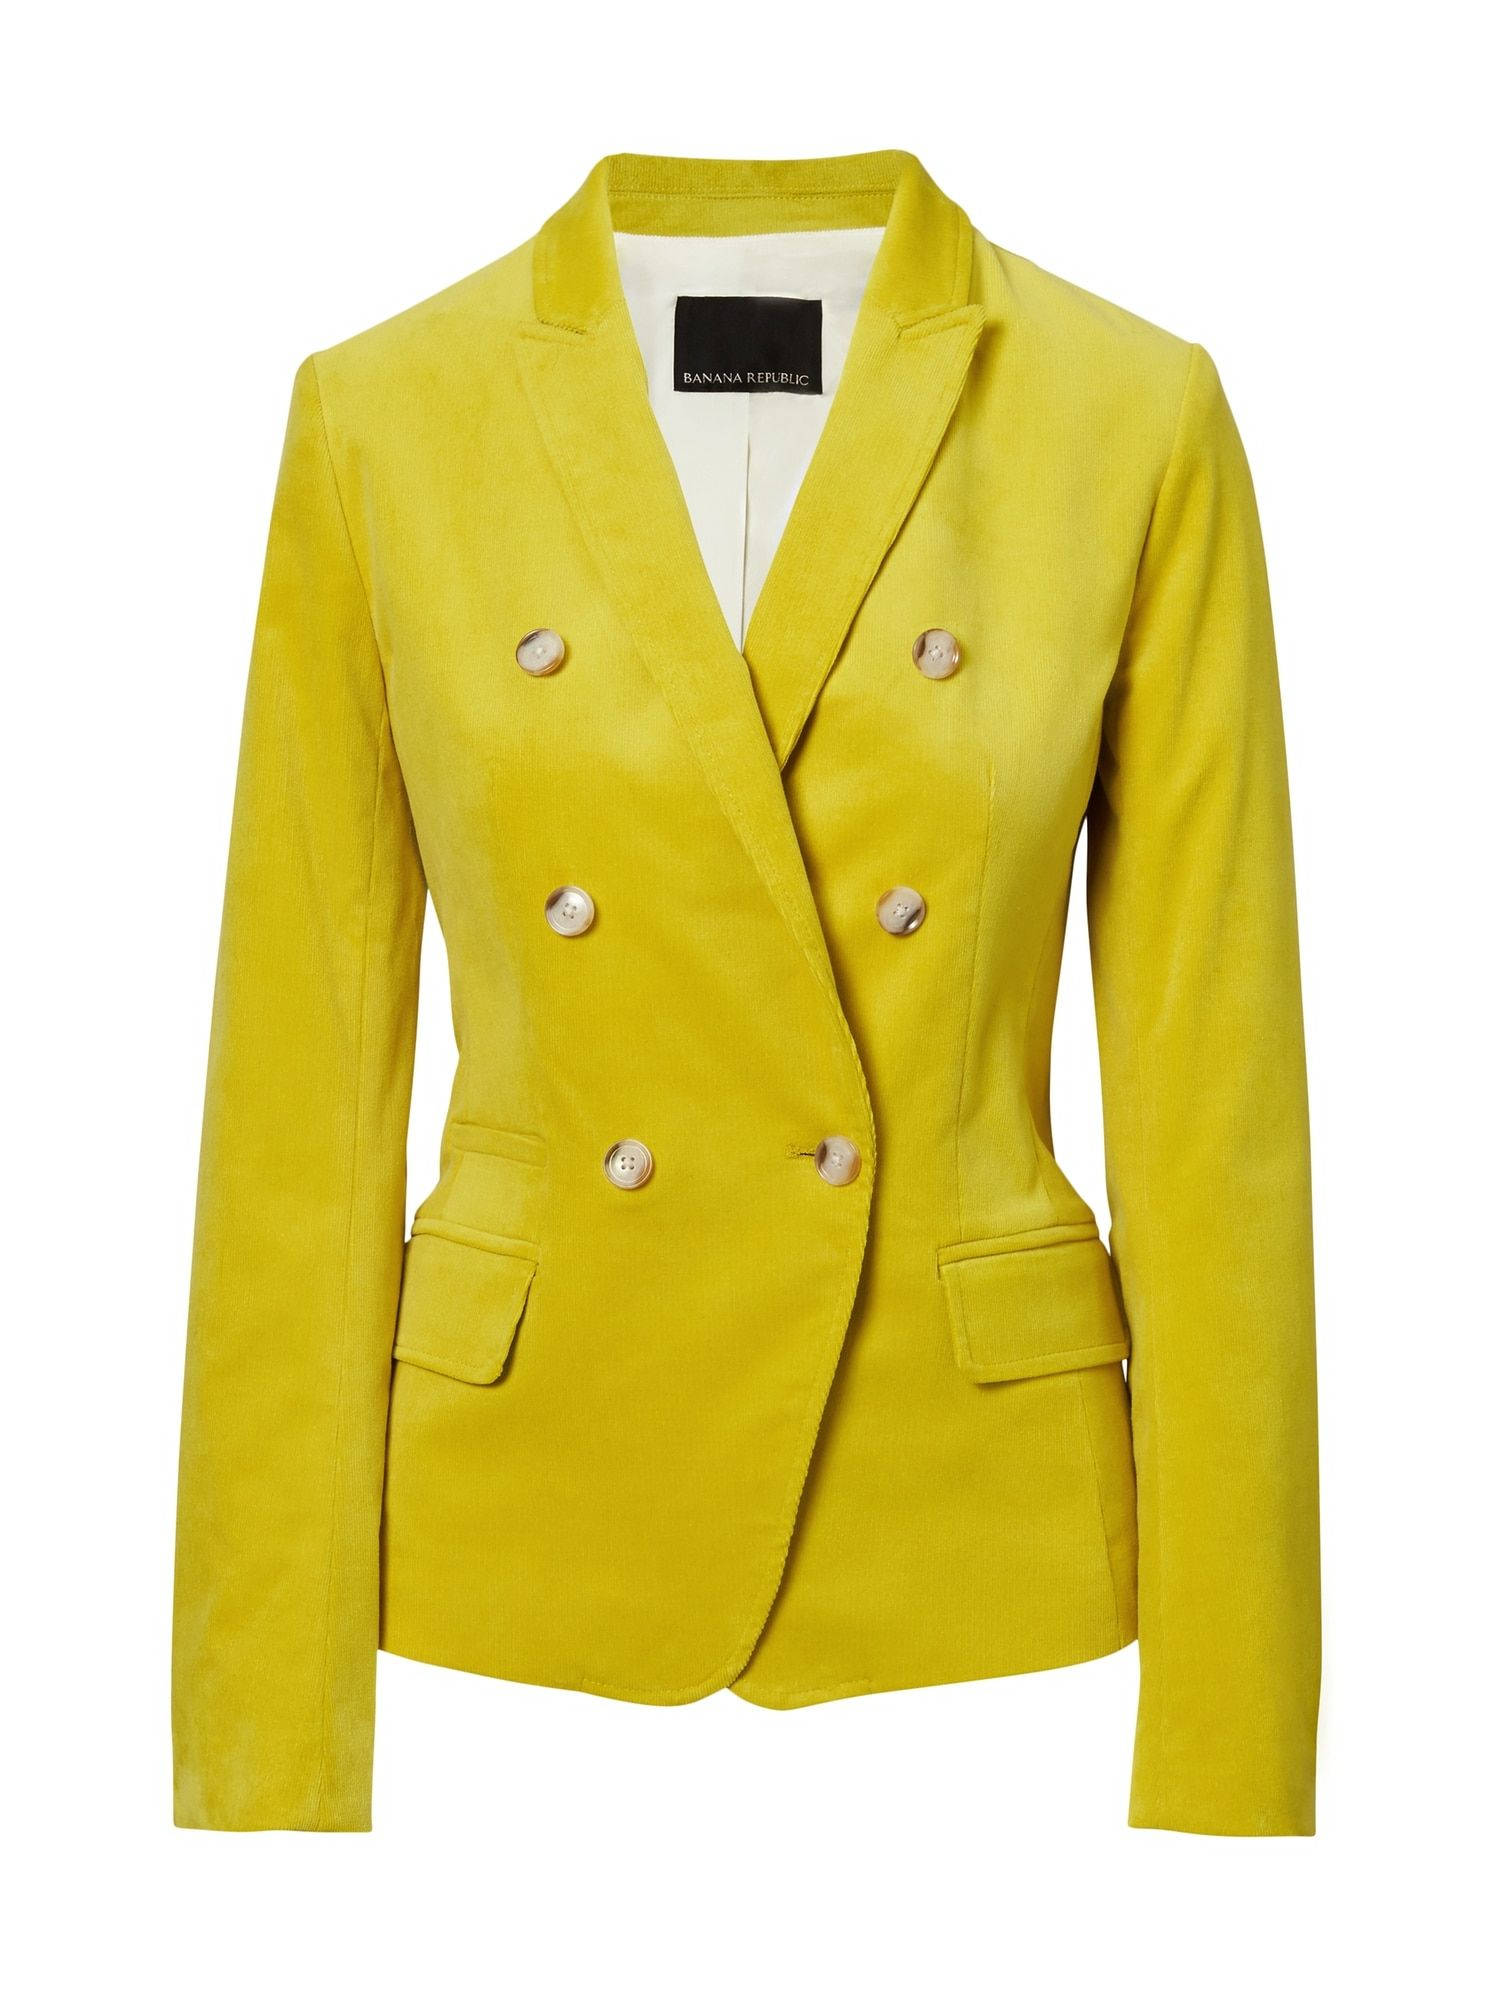 Chartreuse blazer